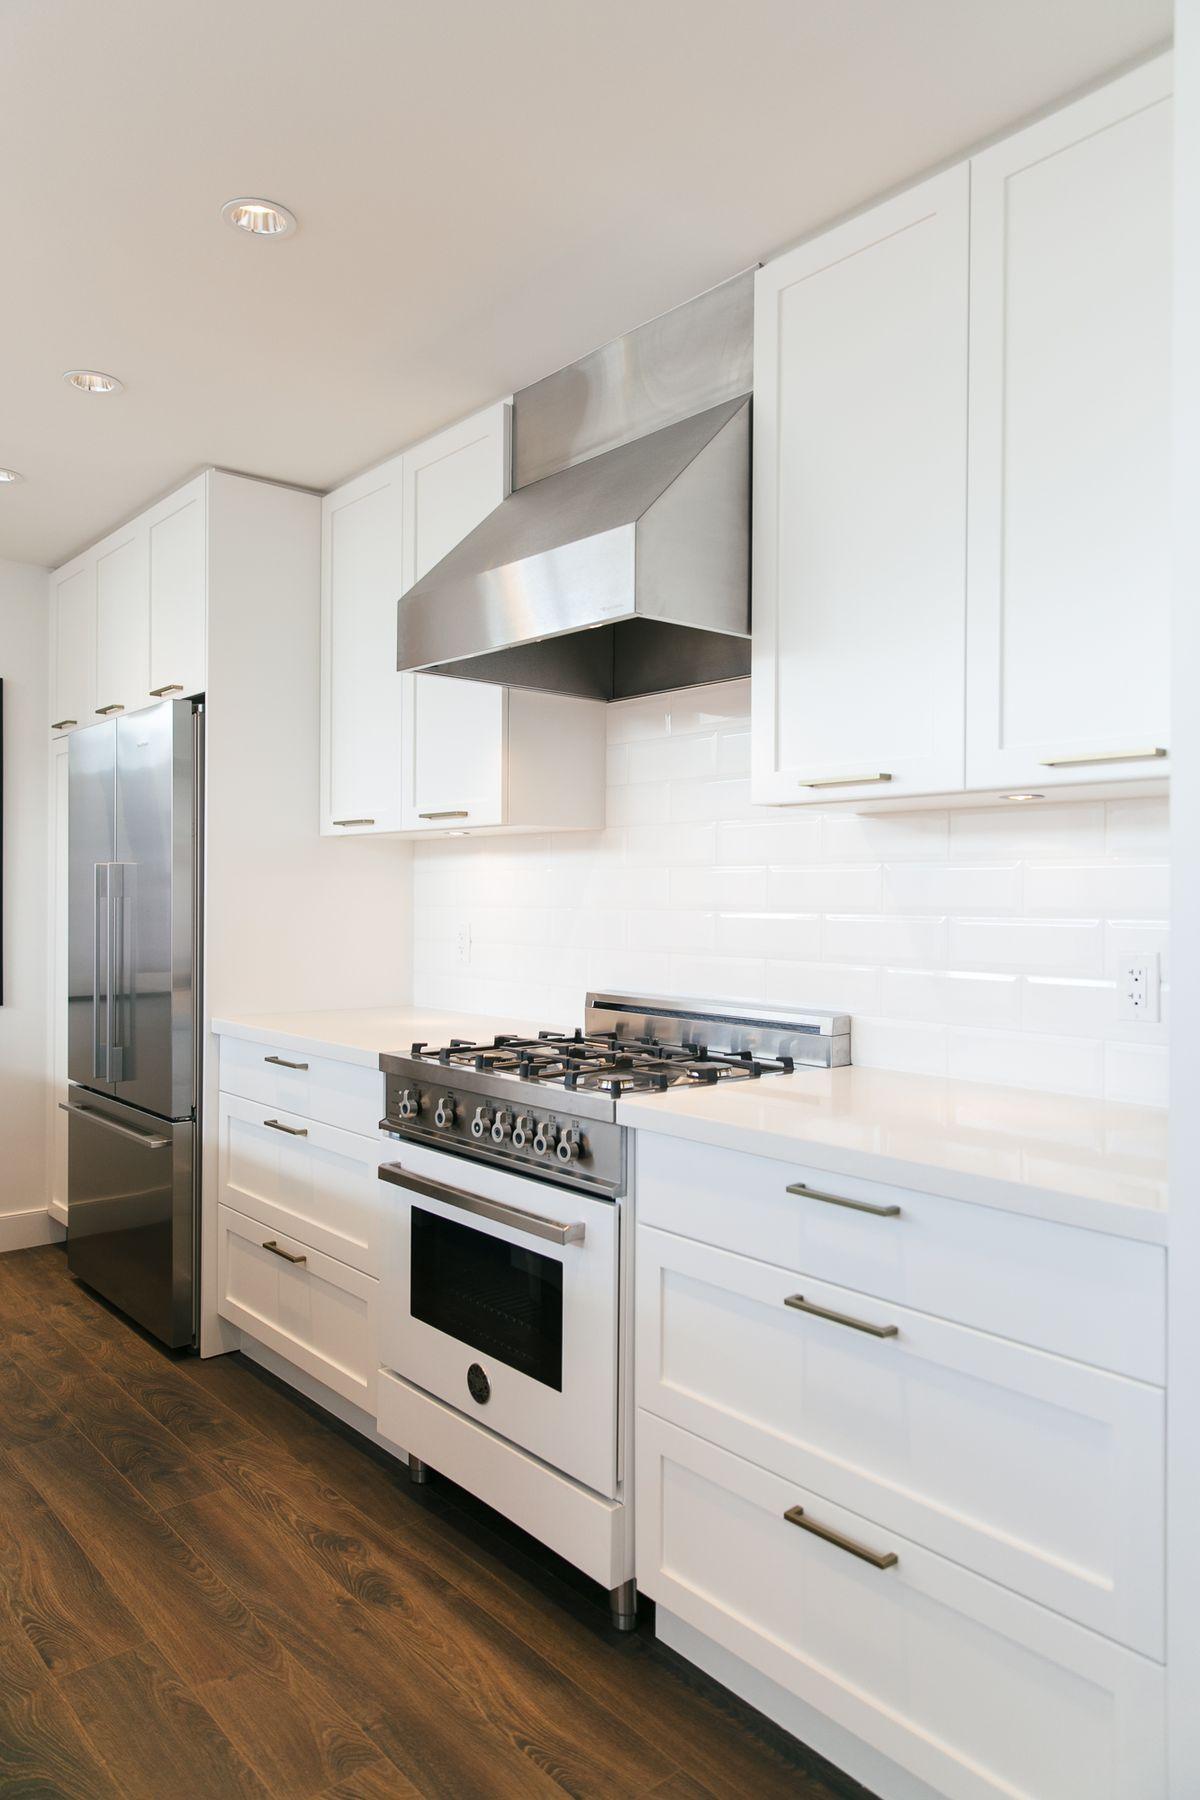 Awesome Kitchen Cabinet Range Hood Design